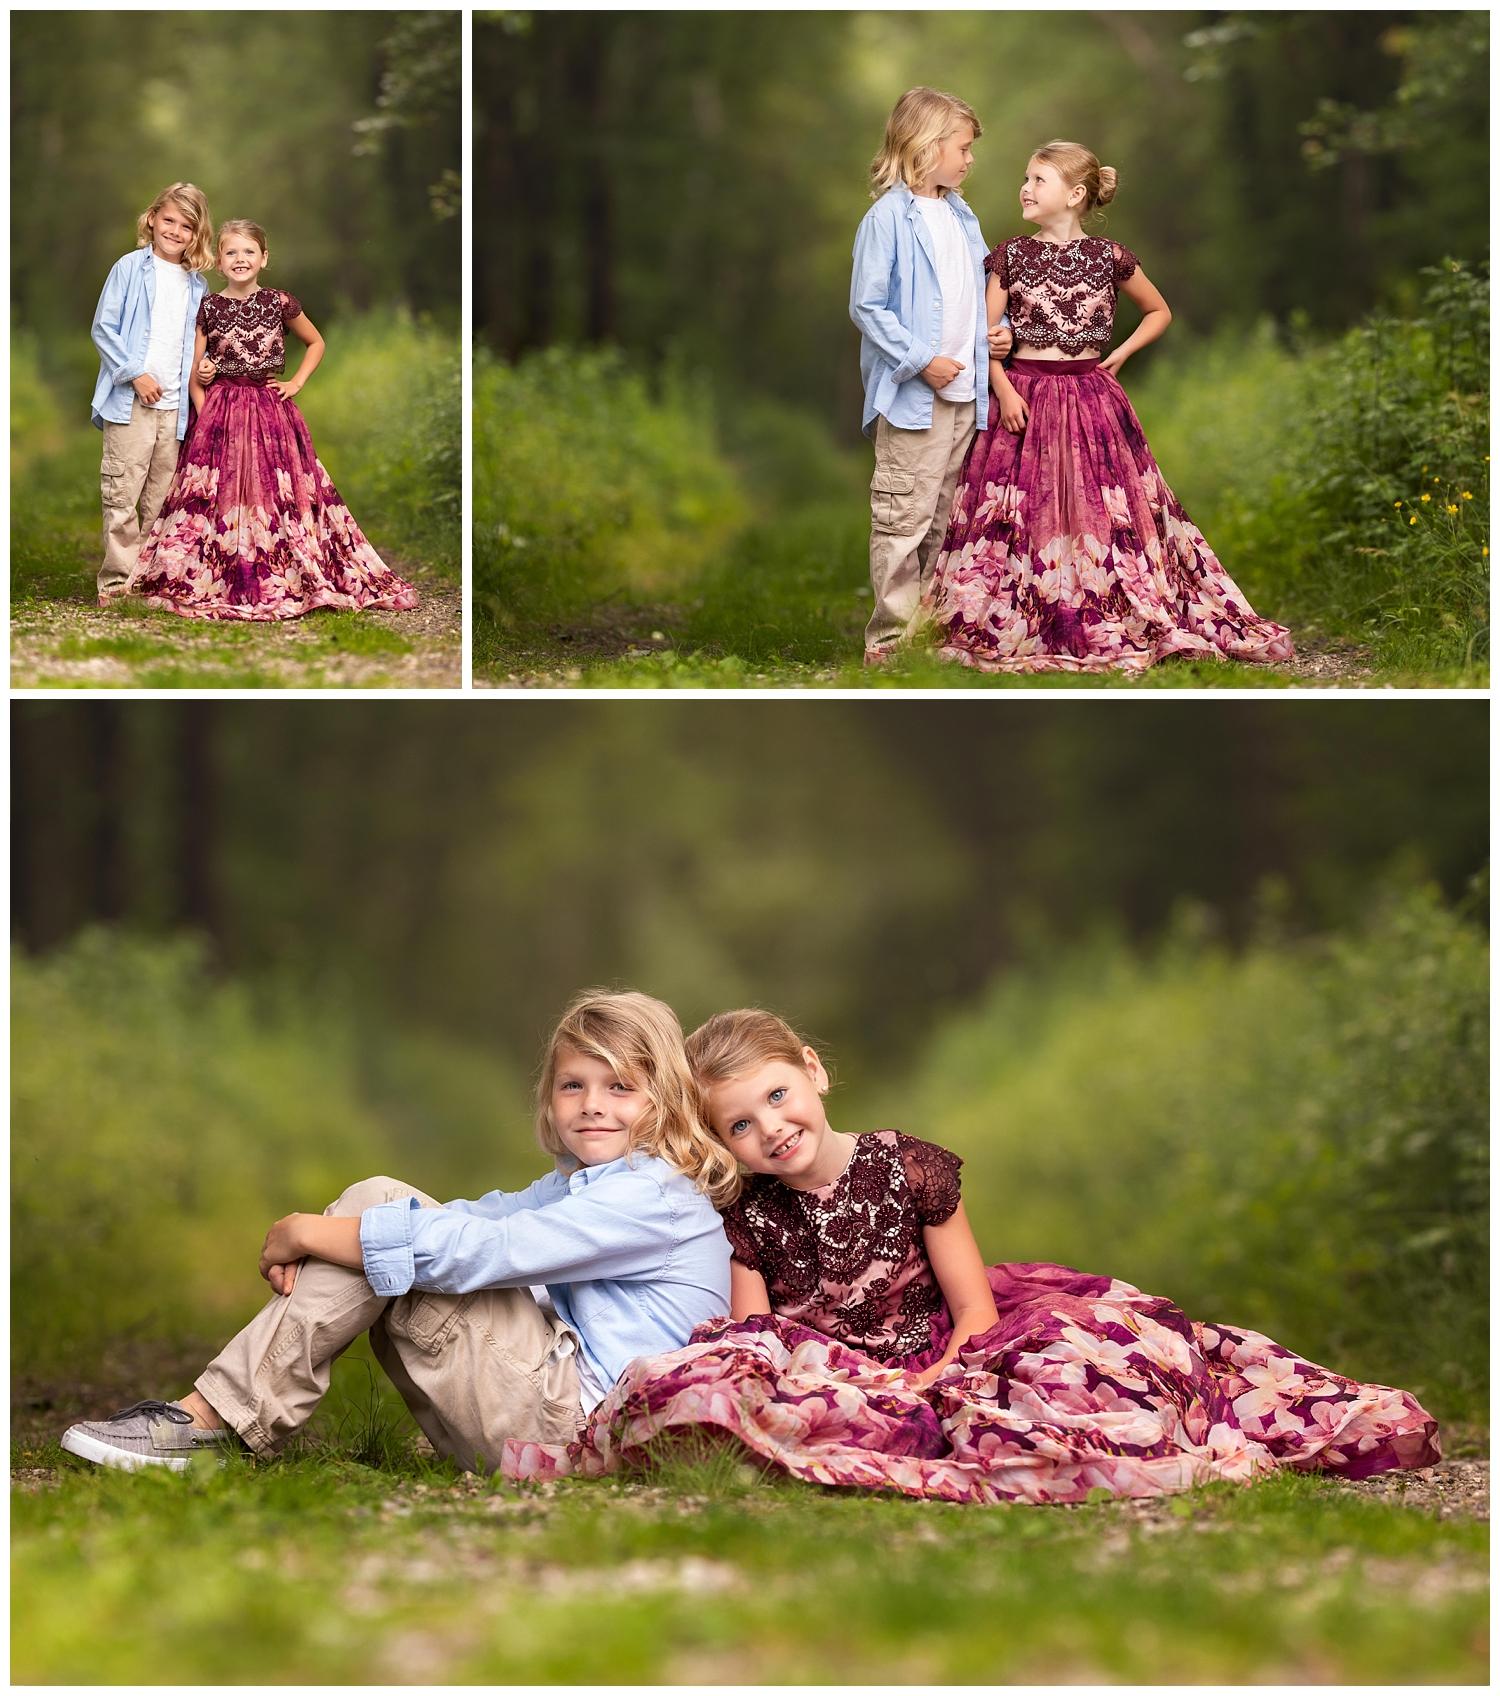 sibling photo shoot in South Kingstown, RI